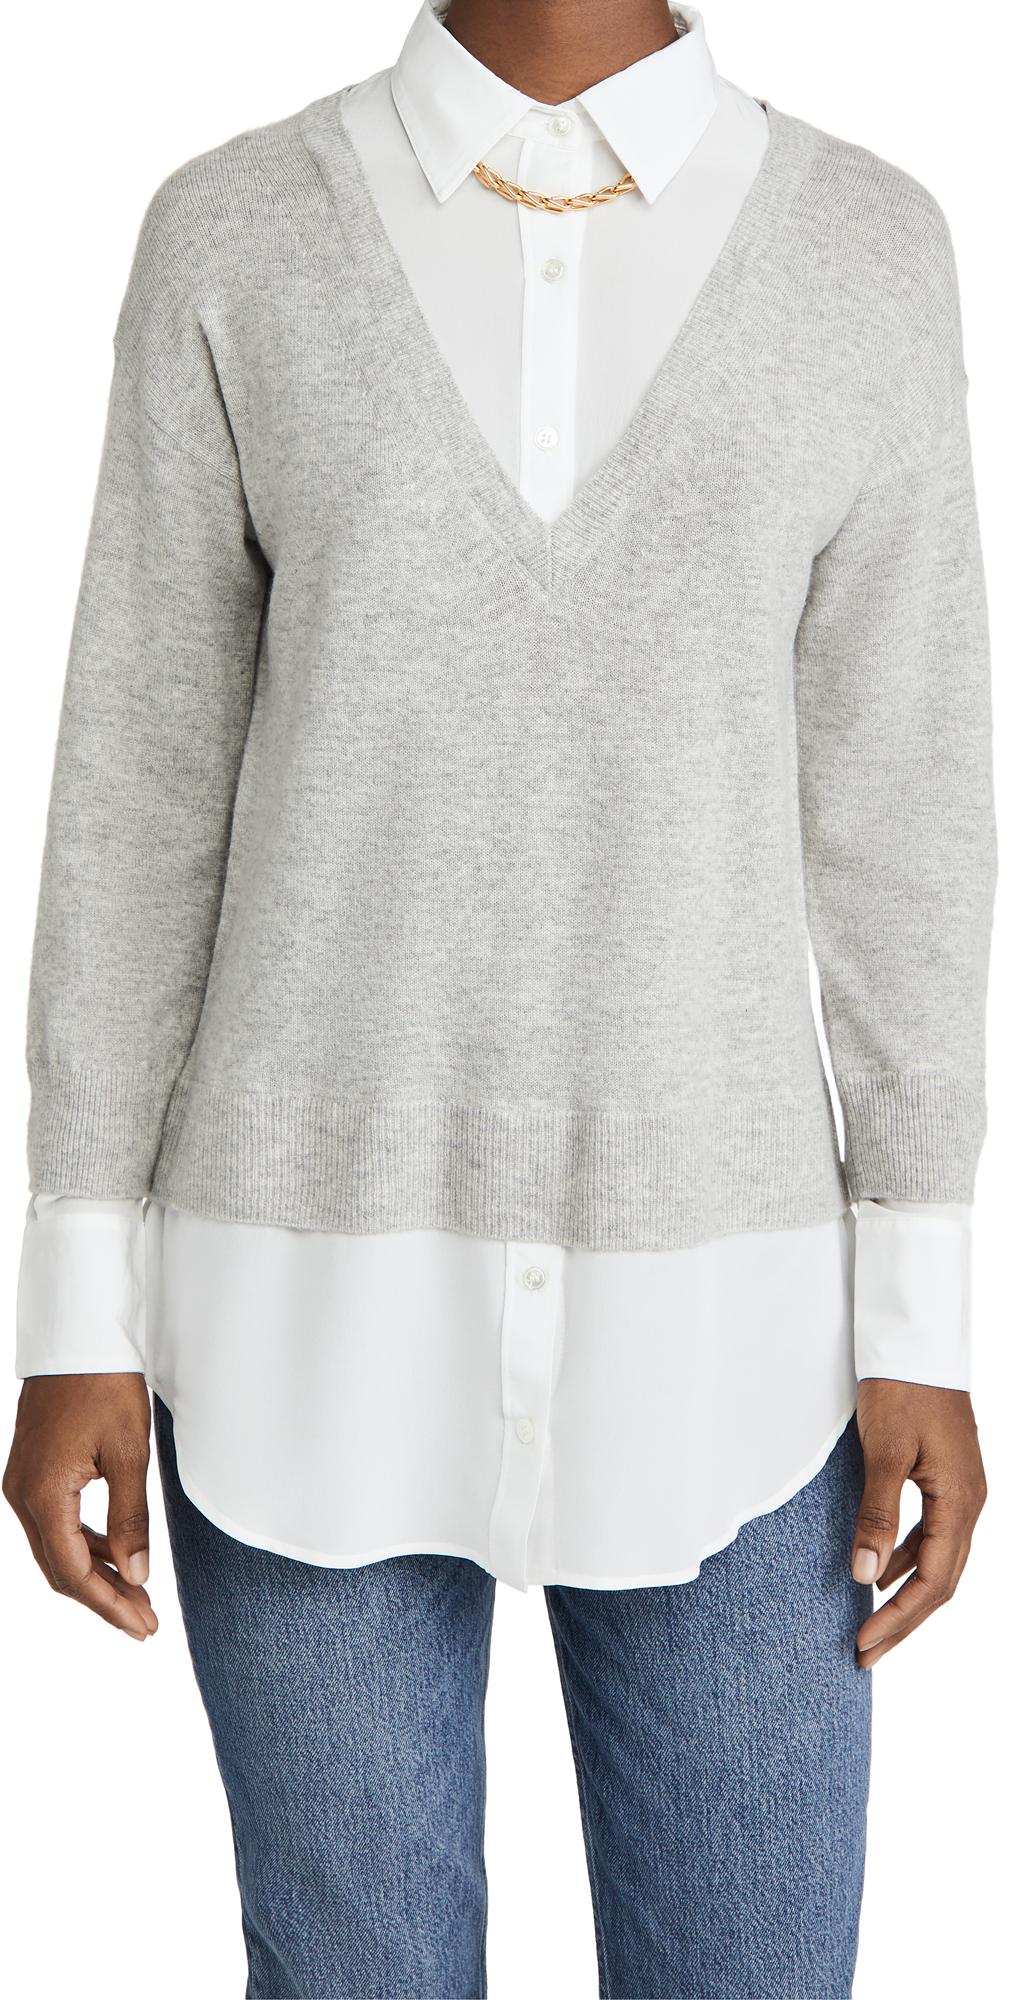 Veronica Beard Brami Mixed Media Sweater